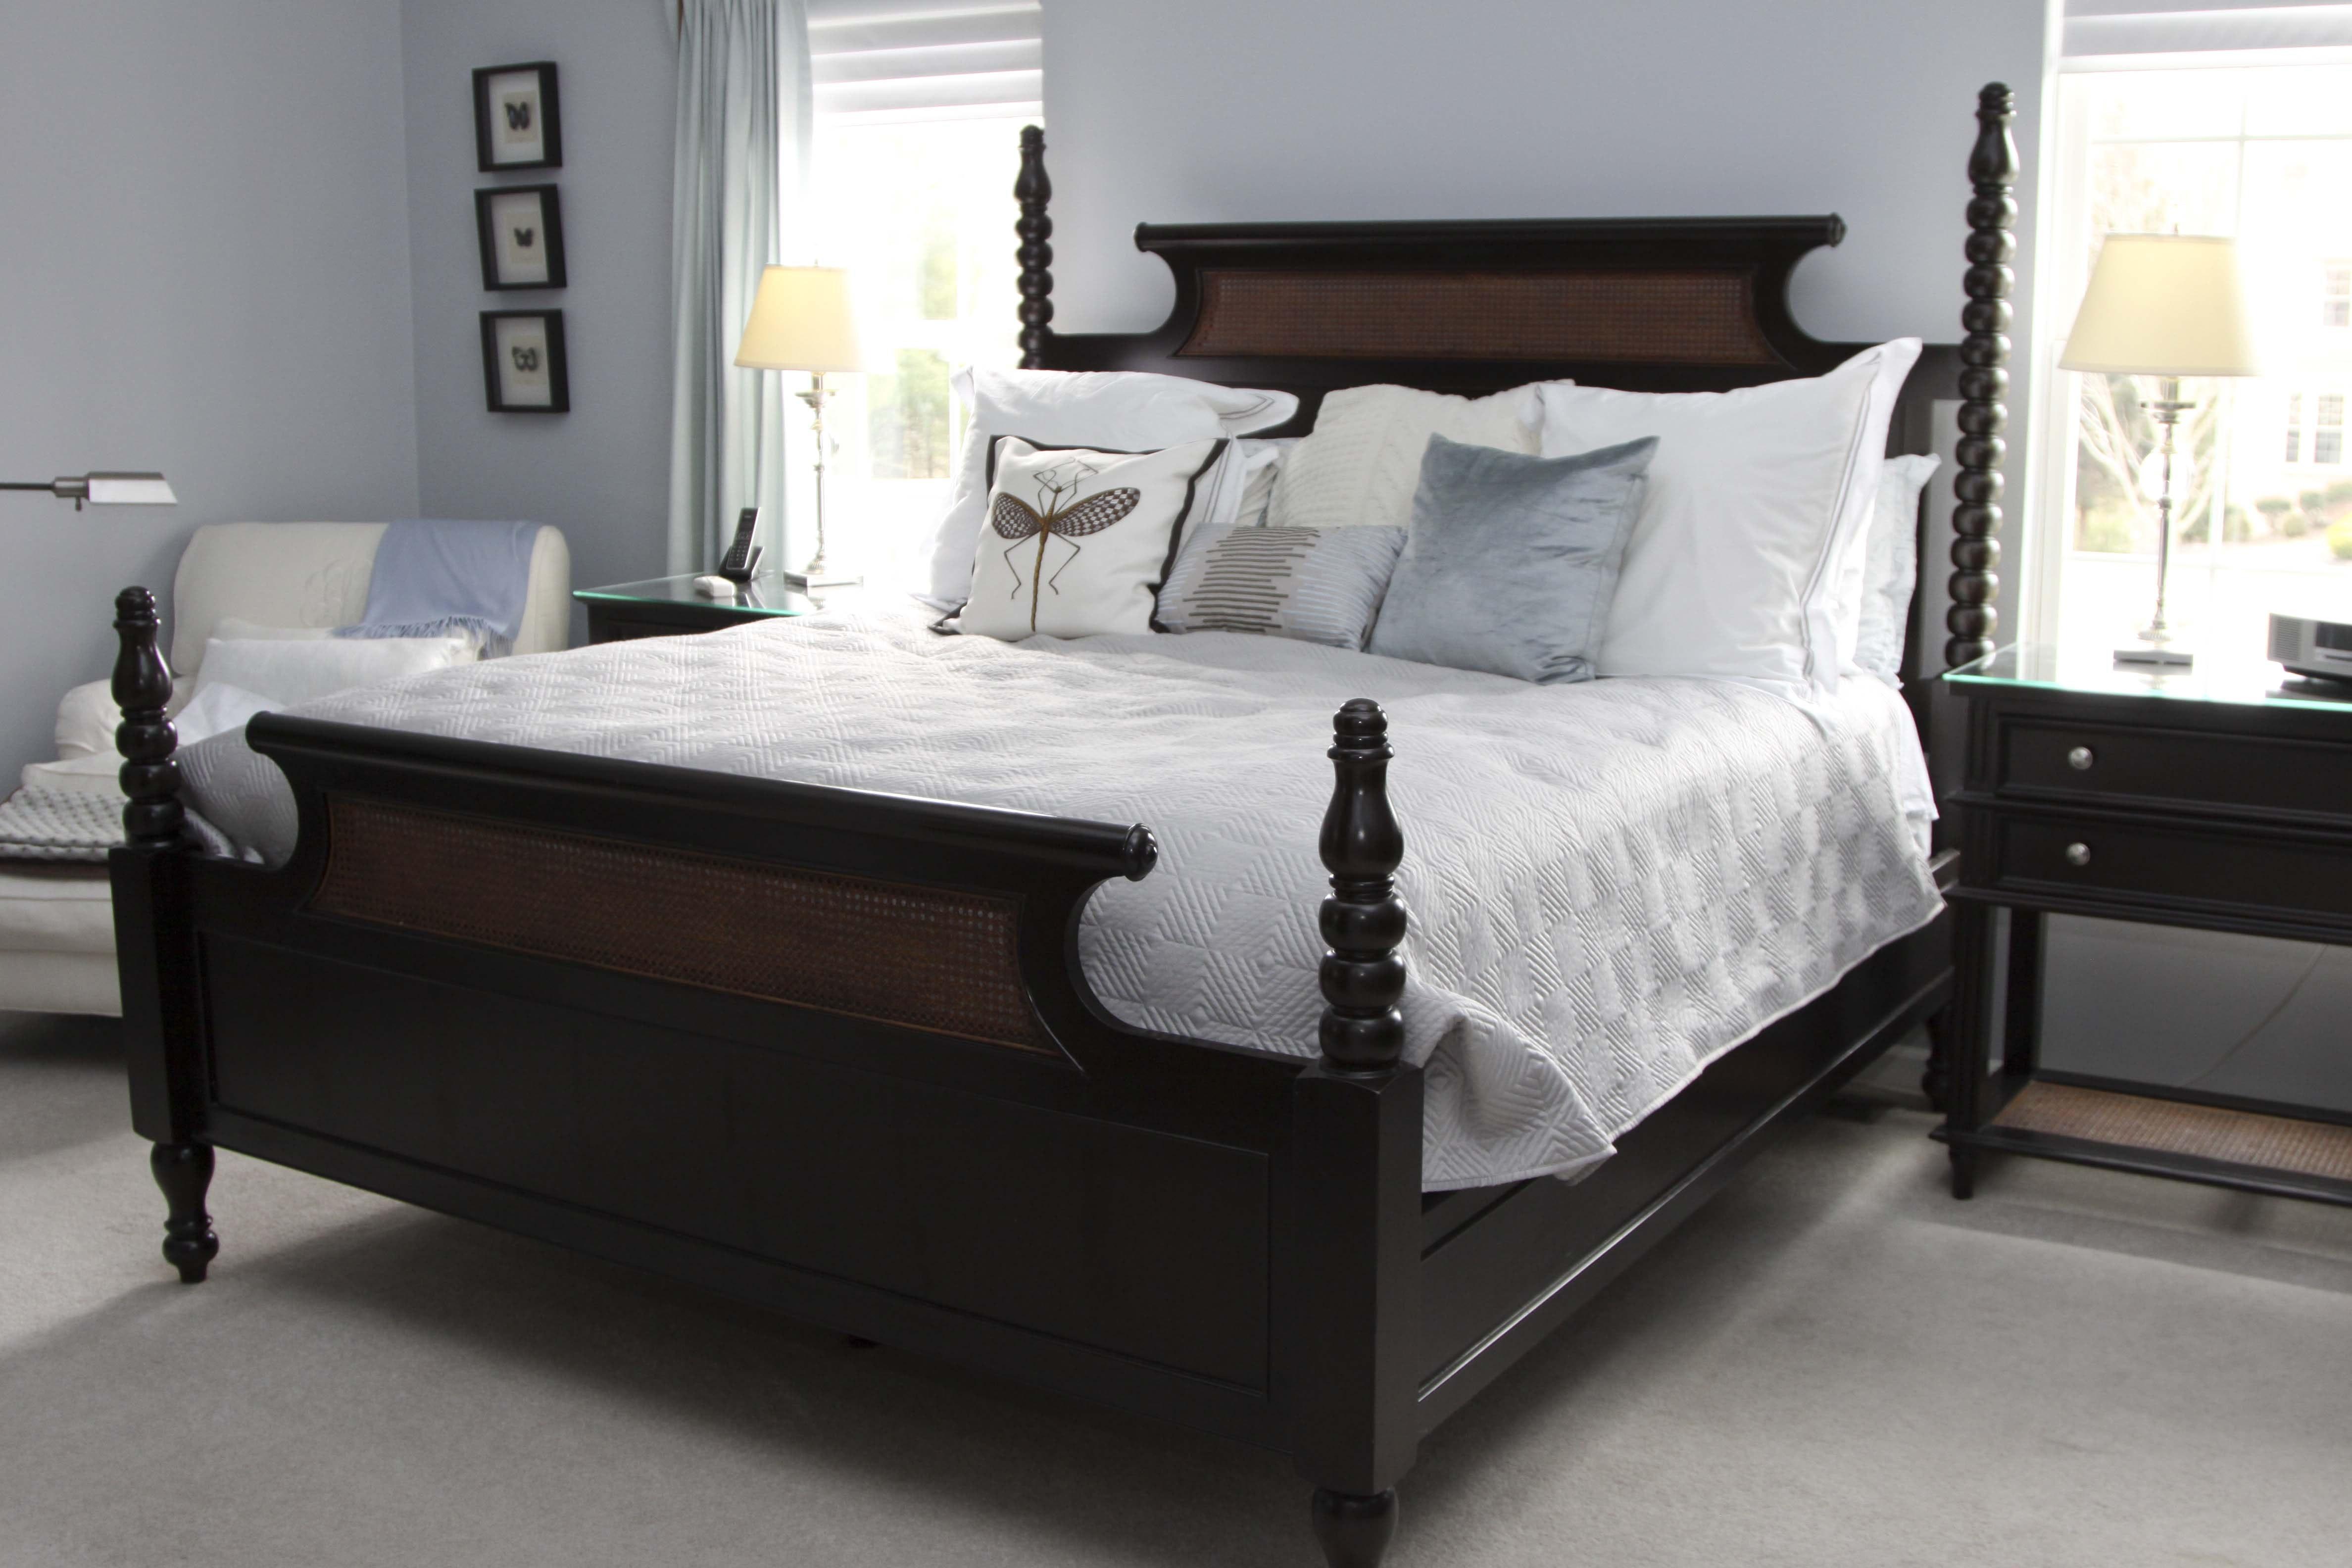 "Drexel Heritage"" Dakota"" King Bed and Step Stool"